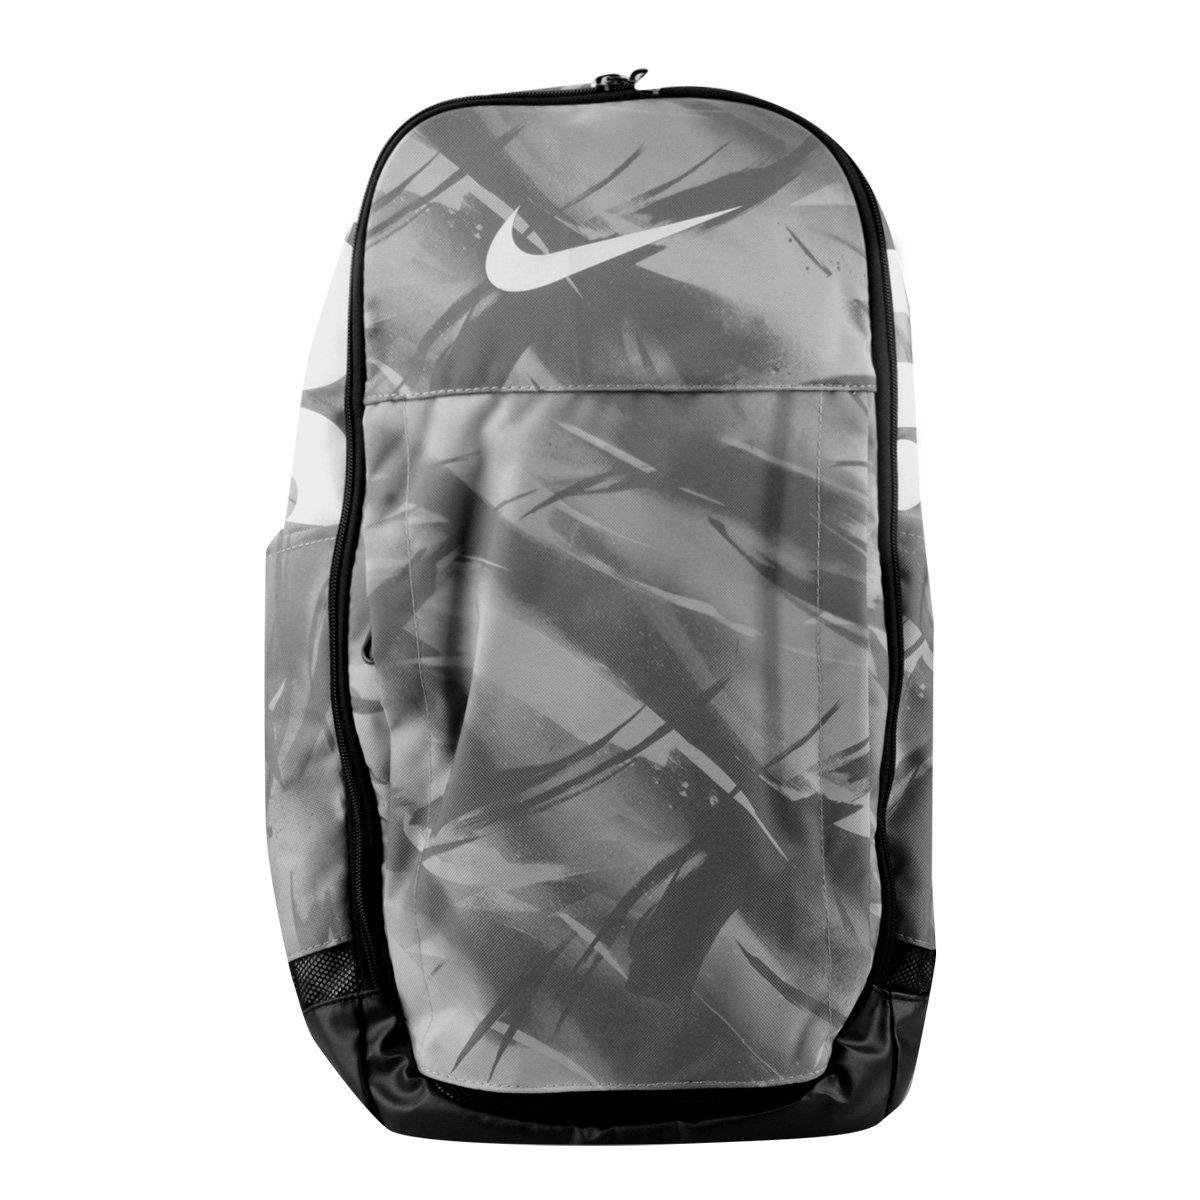 Mochila Nike Brasília - Compre Agora  8246cb48036f2